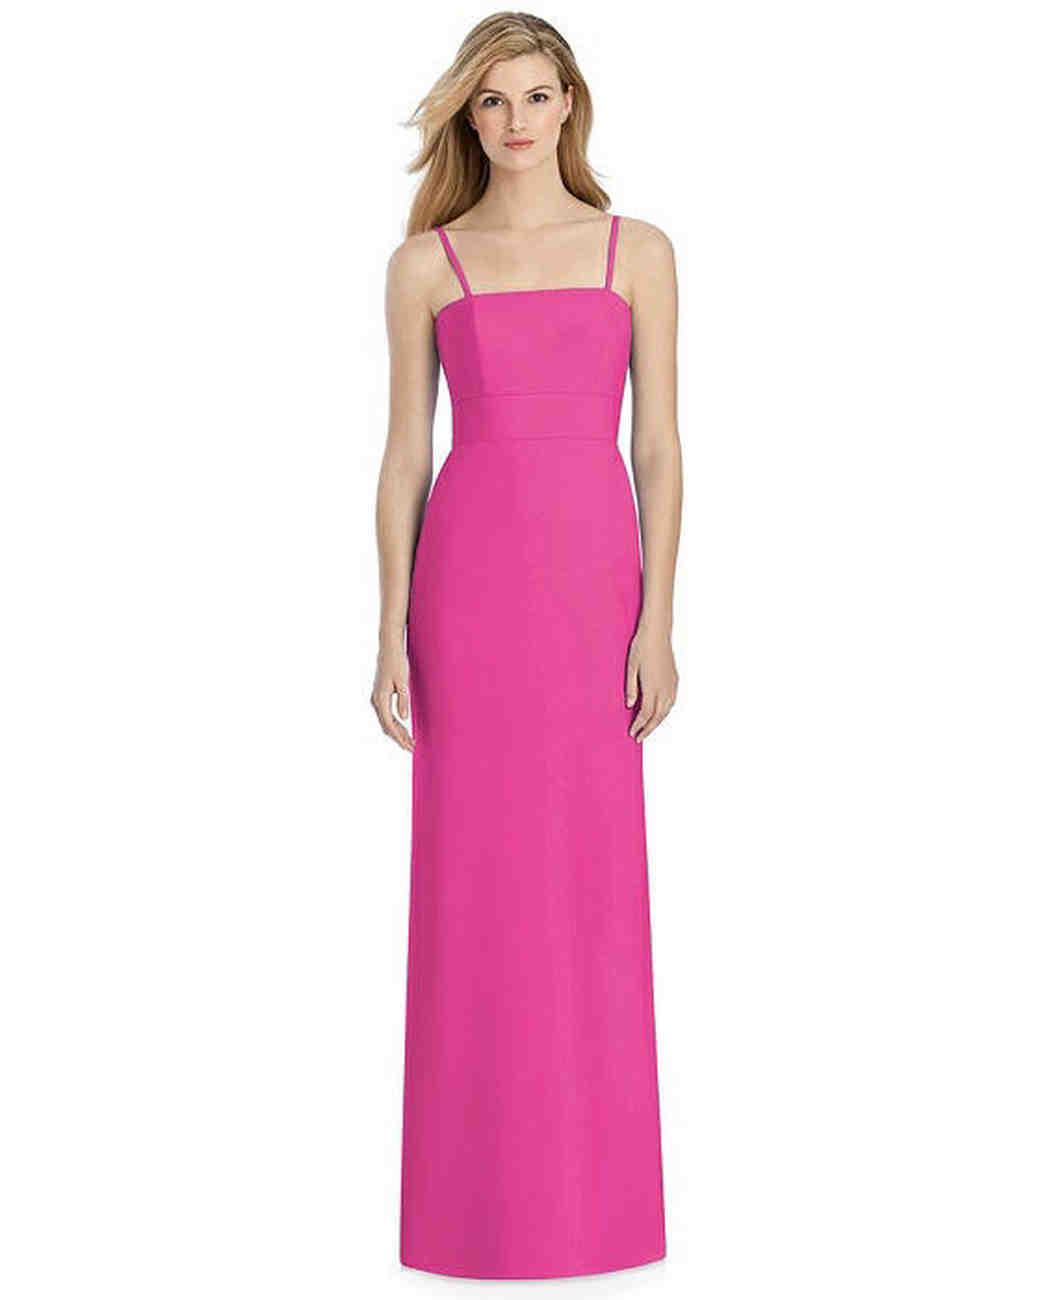 pink sheath bridesmaid spaghetti strap dress